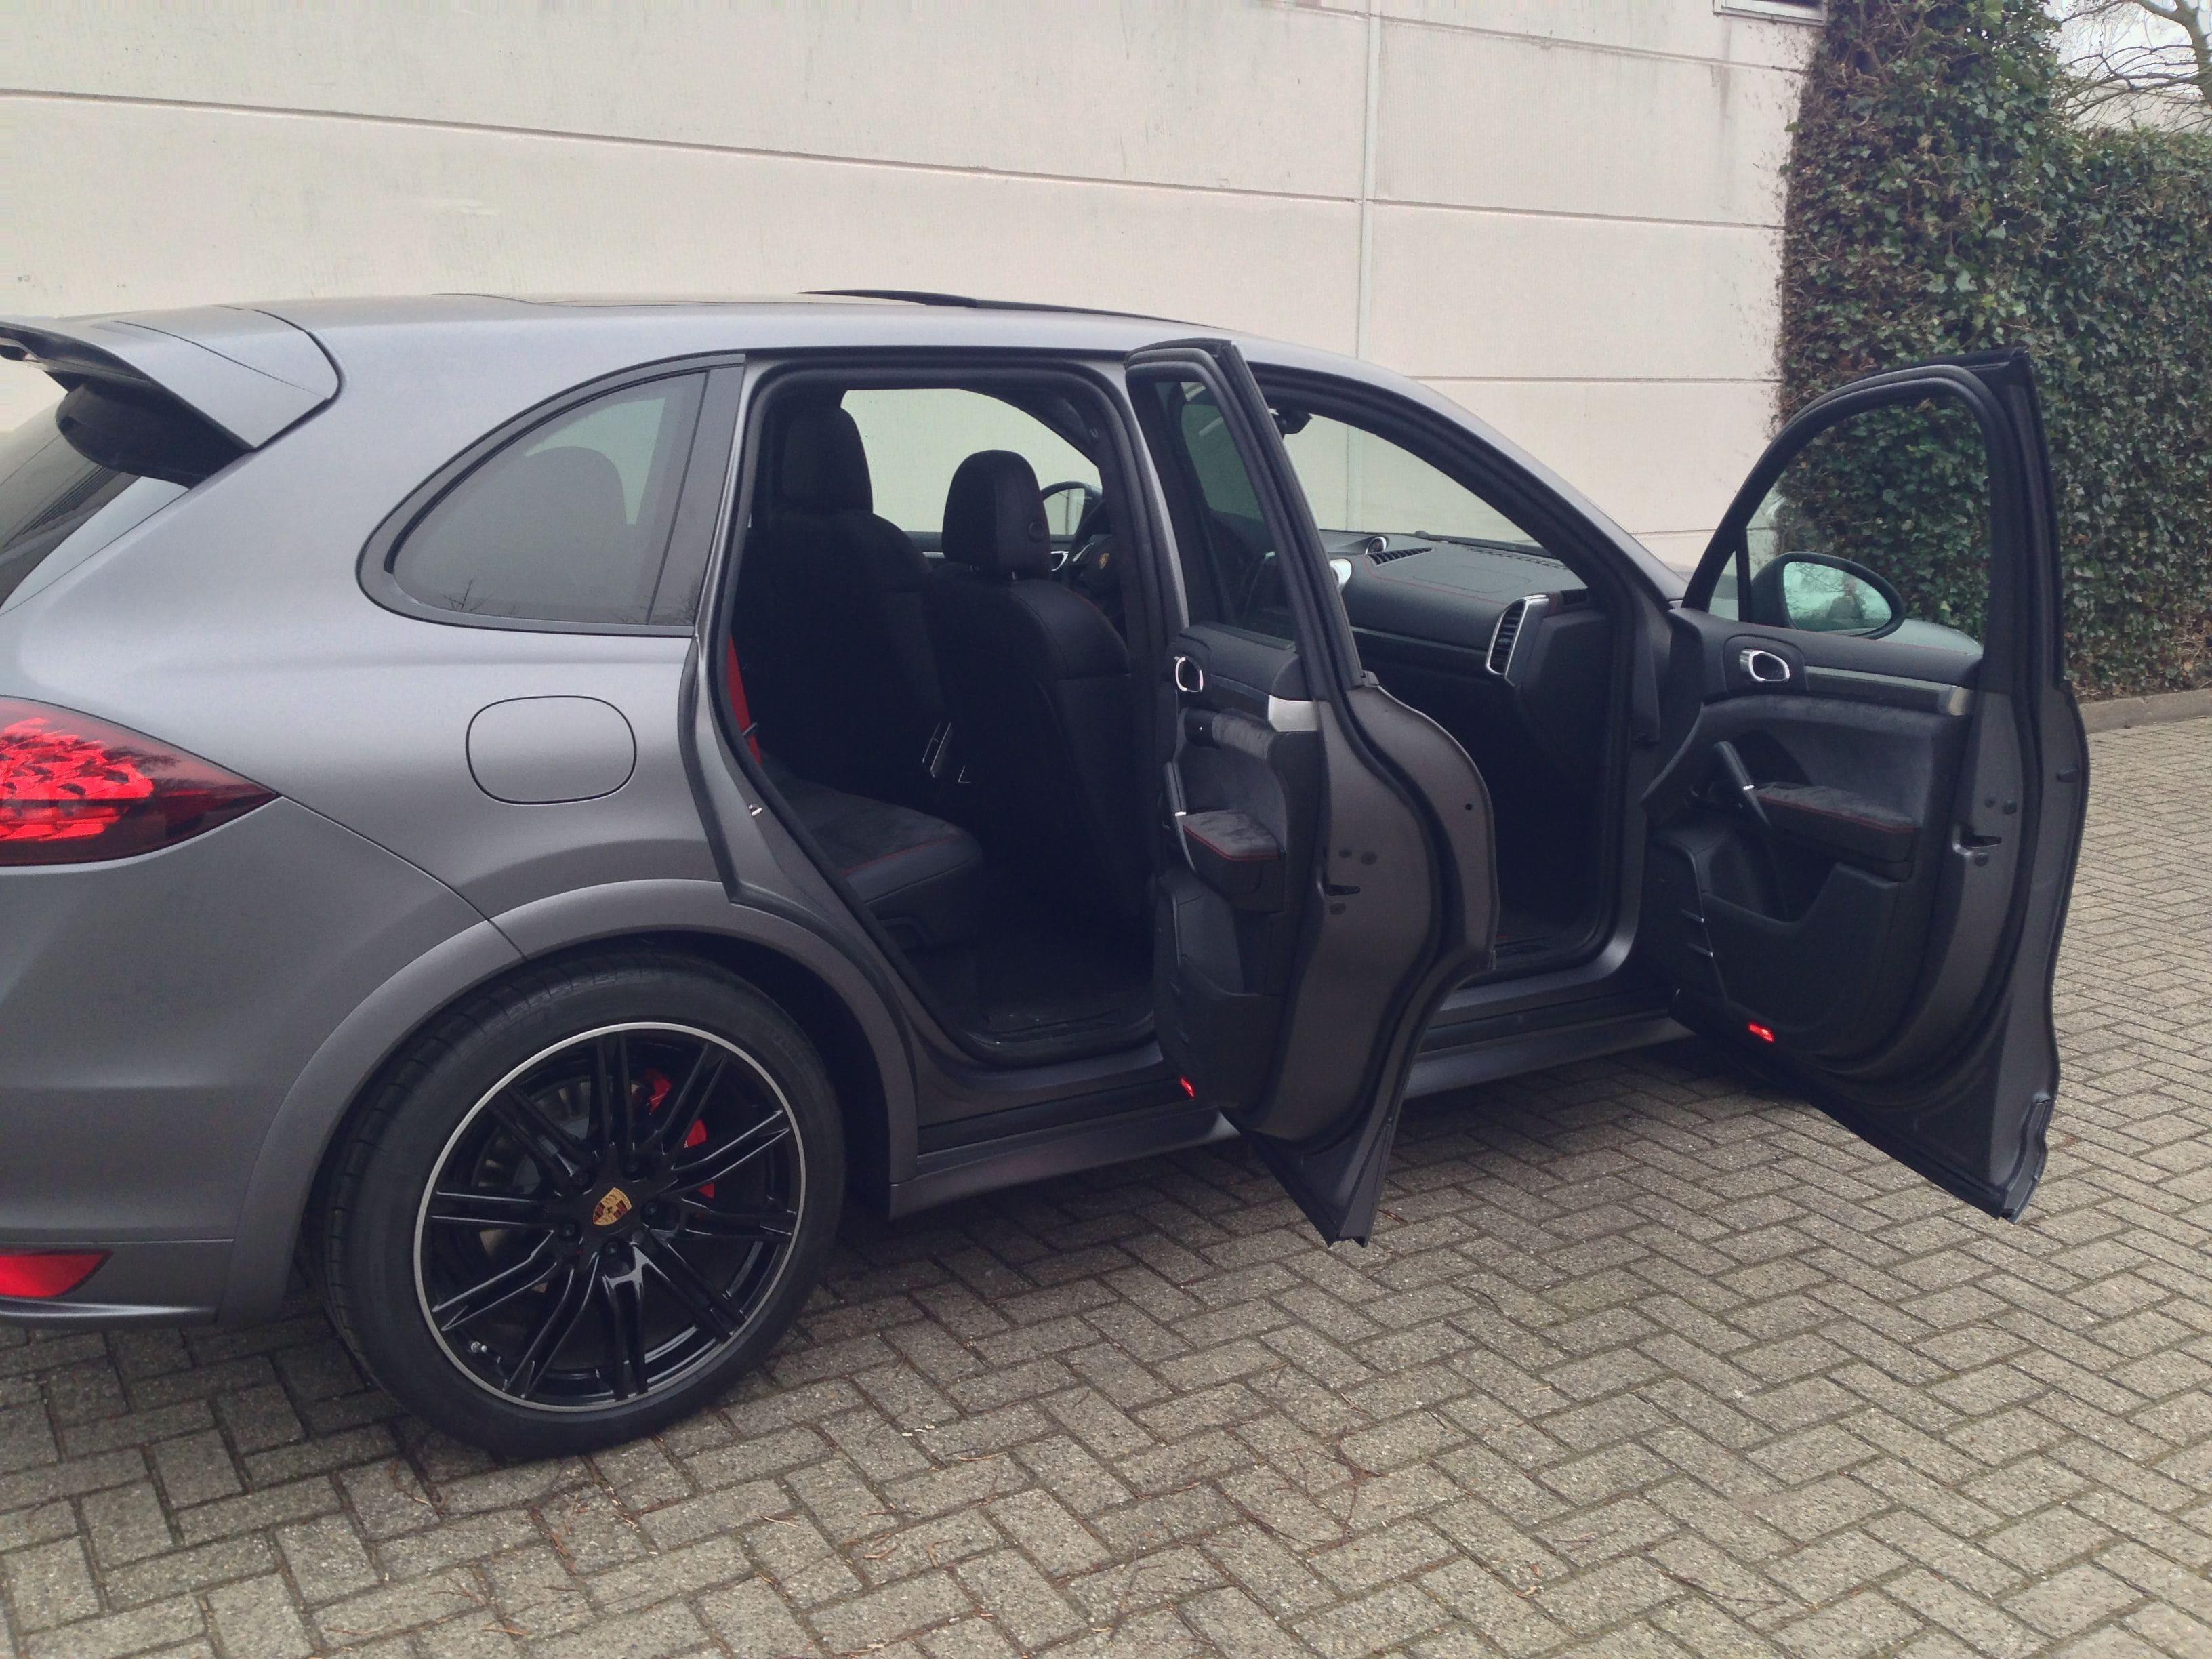 Porsche Cayenne GTS met Gunpowder Wrap, Carwrapping door Wrapmyride.nu Foto-nr:6792, ©2020